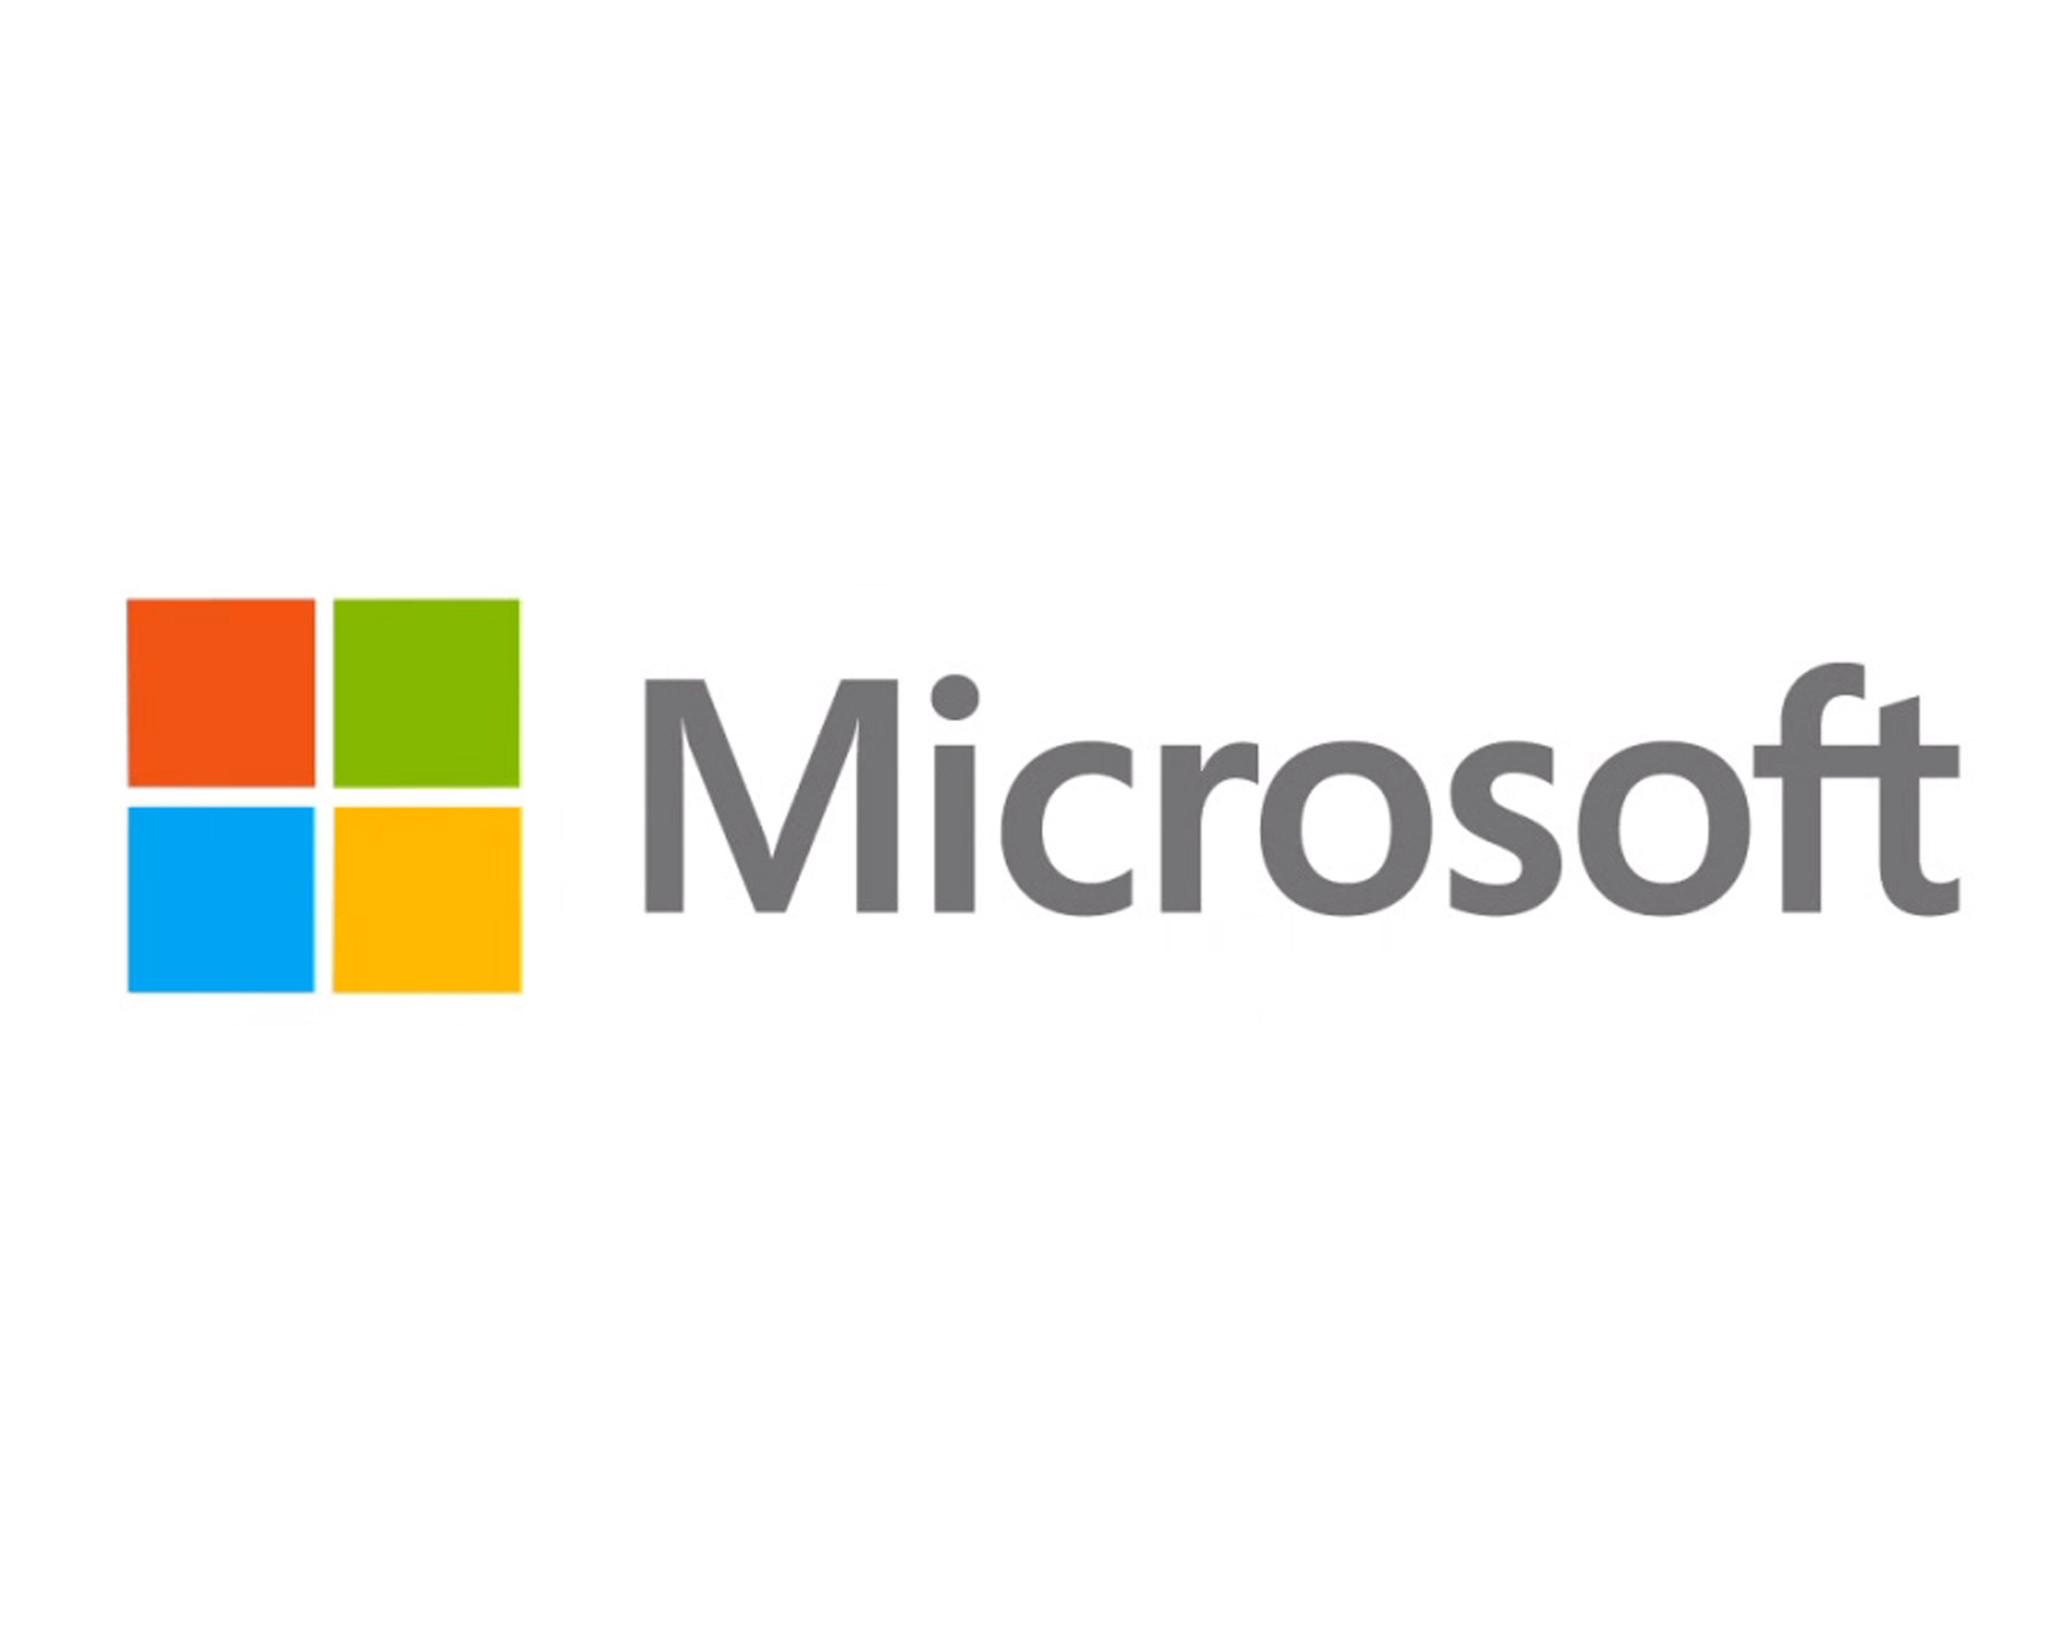 Microsofto_techshohor